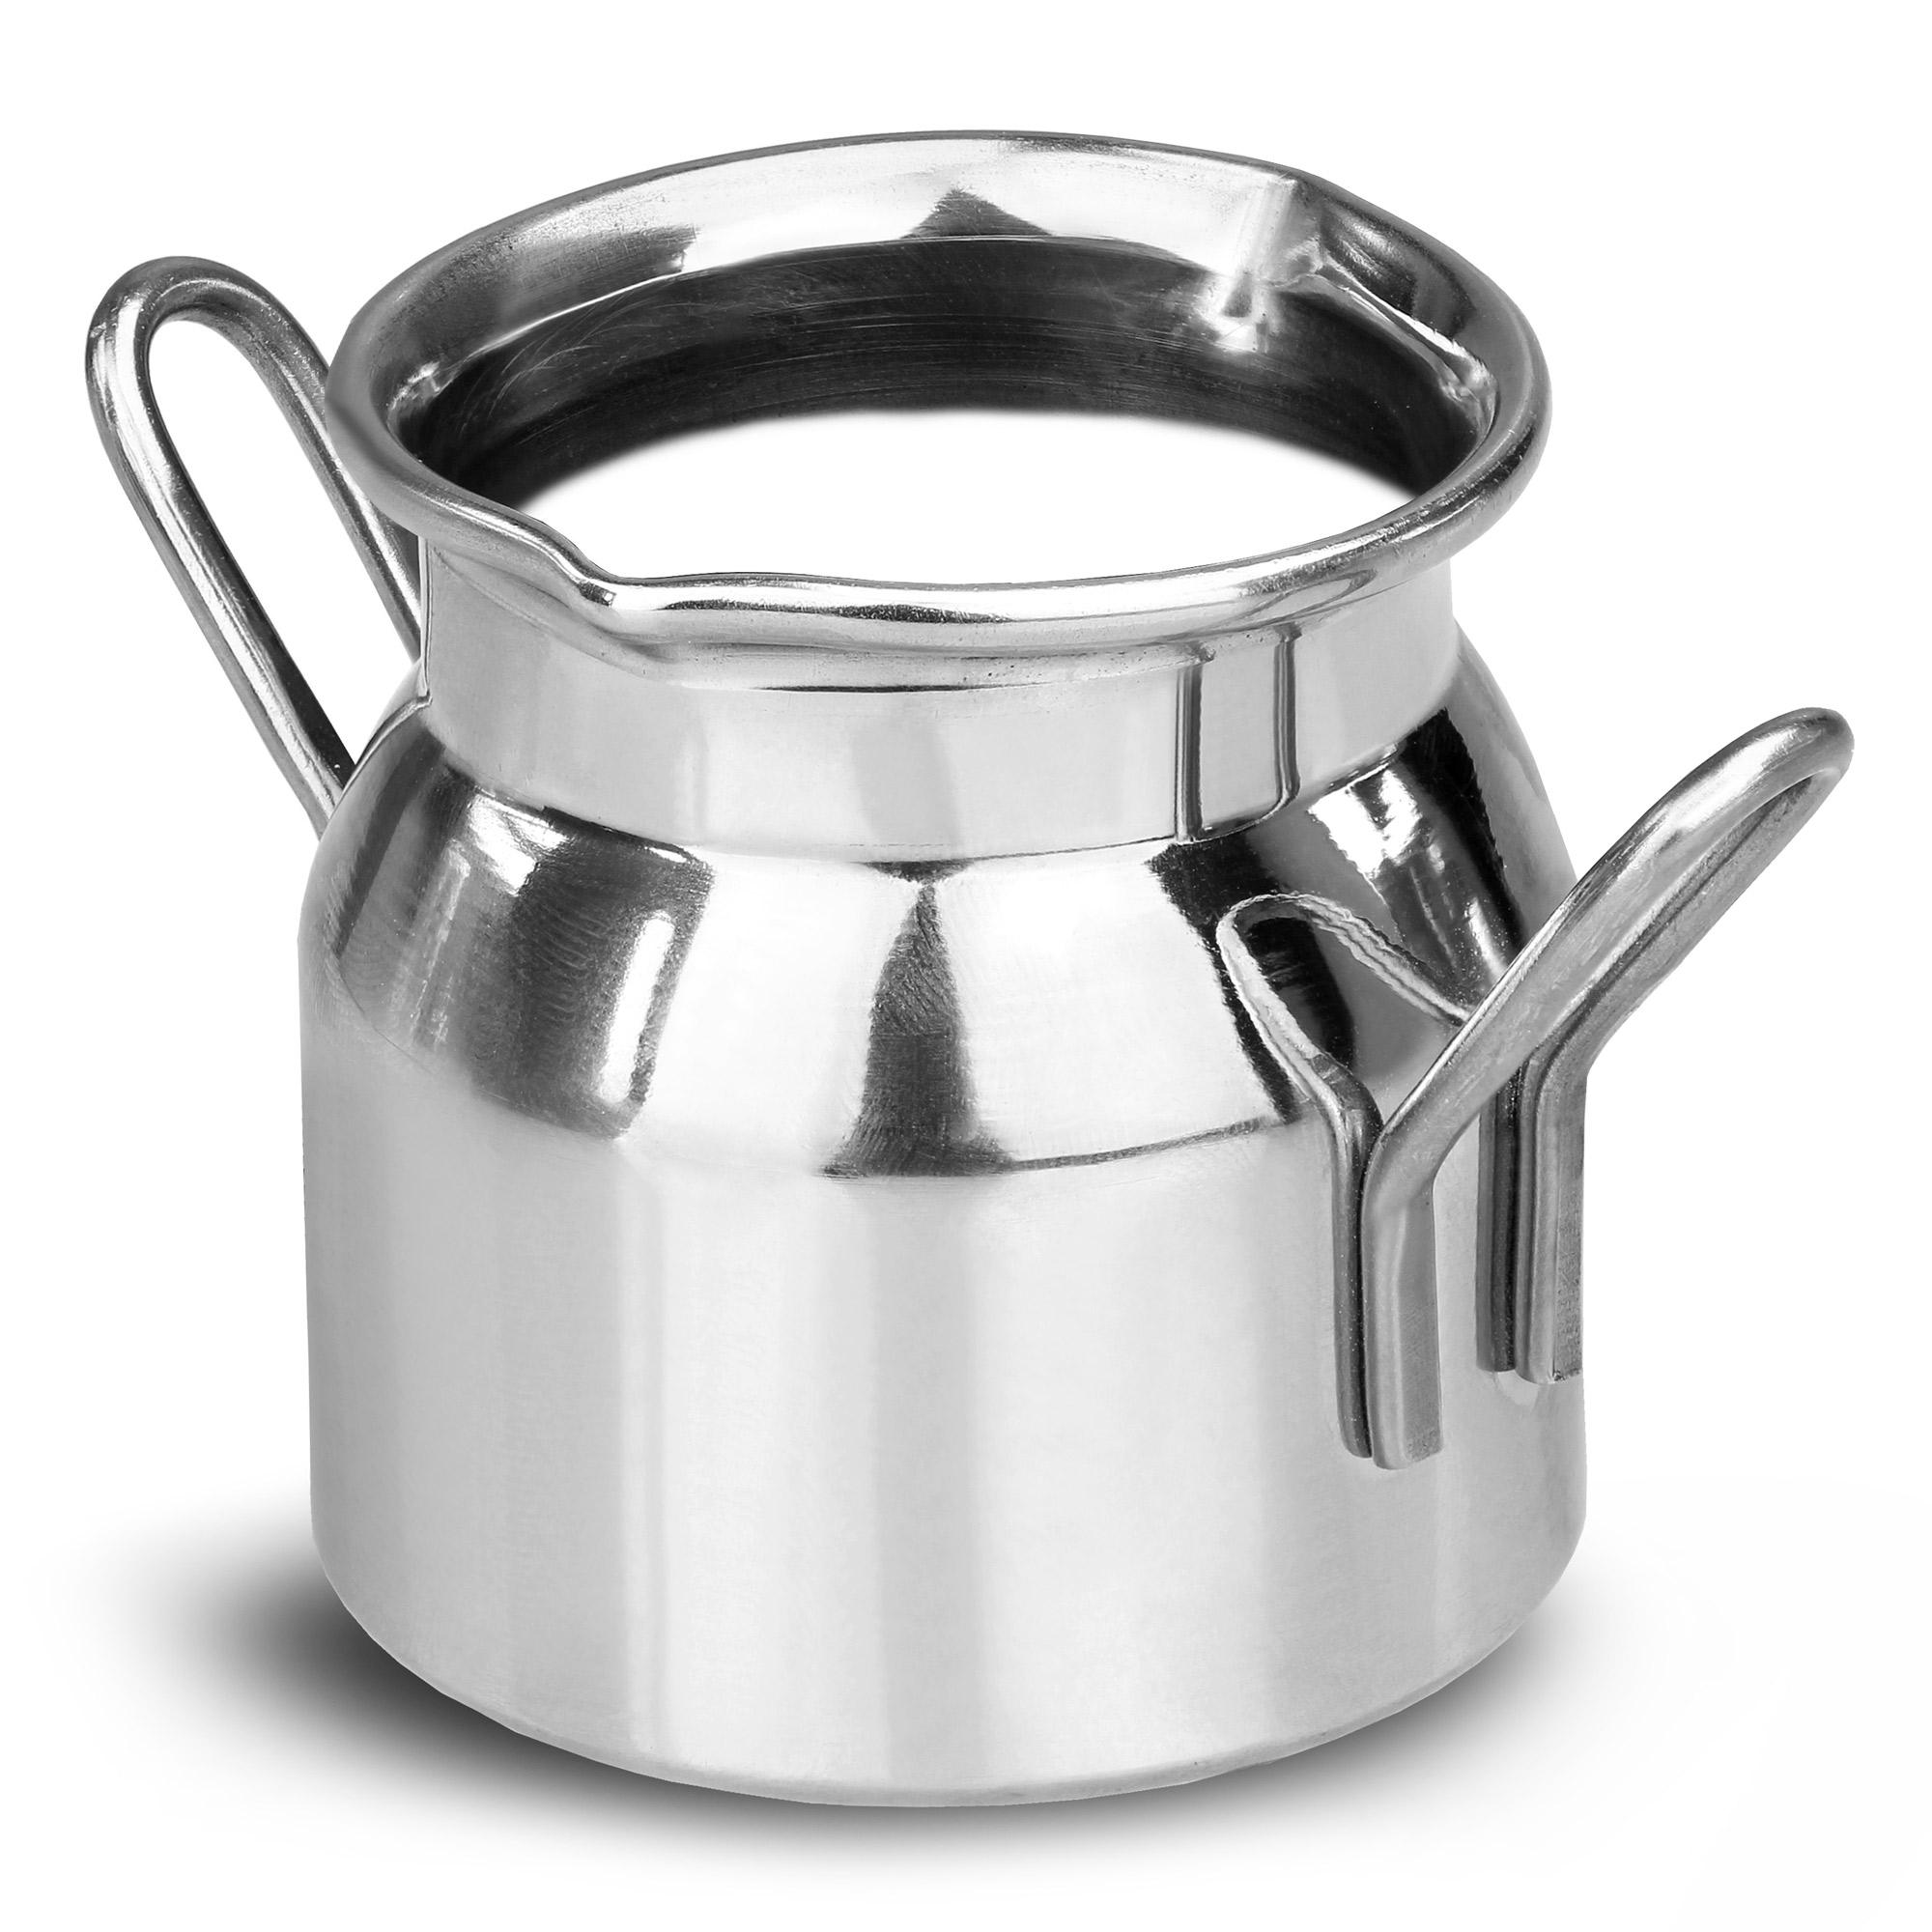 Stainless Steel Mini Milk Churn 2.5oz / 80ml